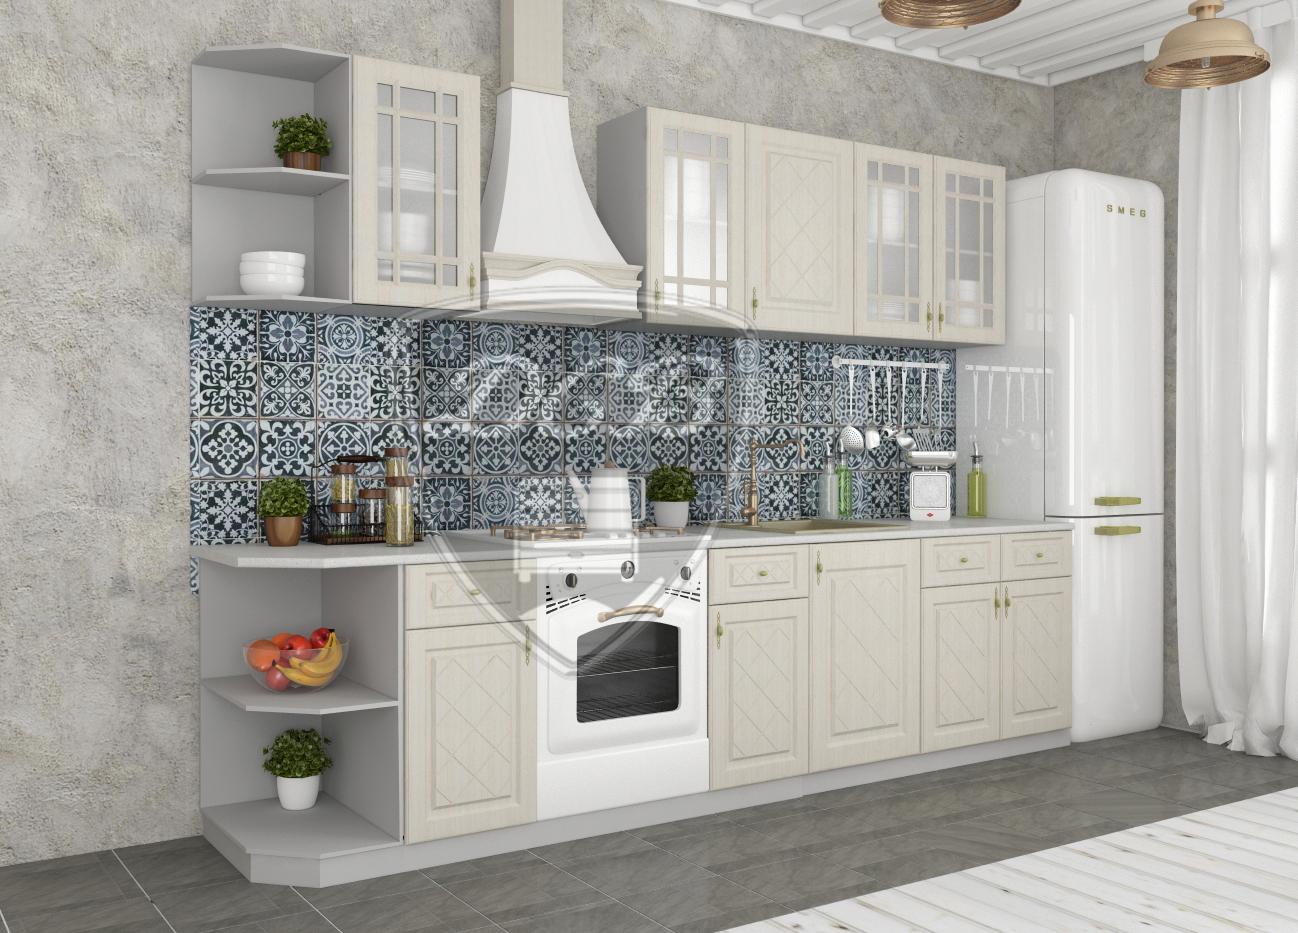 Кухня Гранд ПУ 550 Шкаф верхний угловой